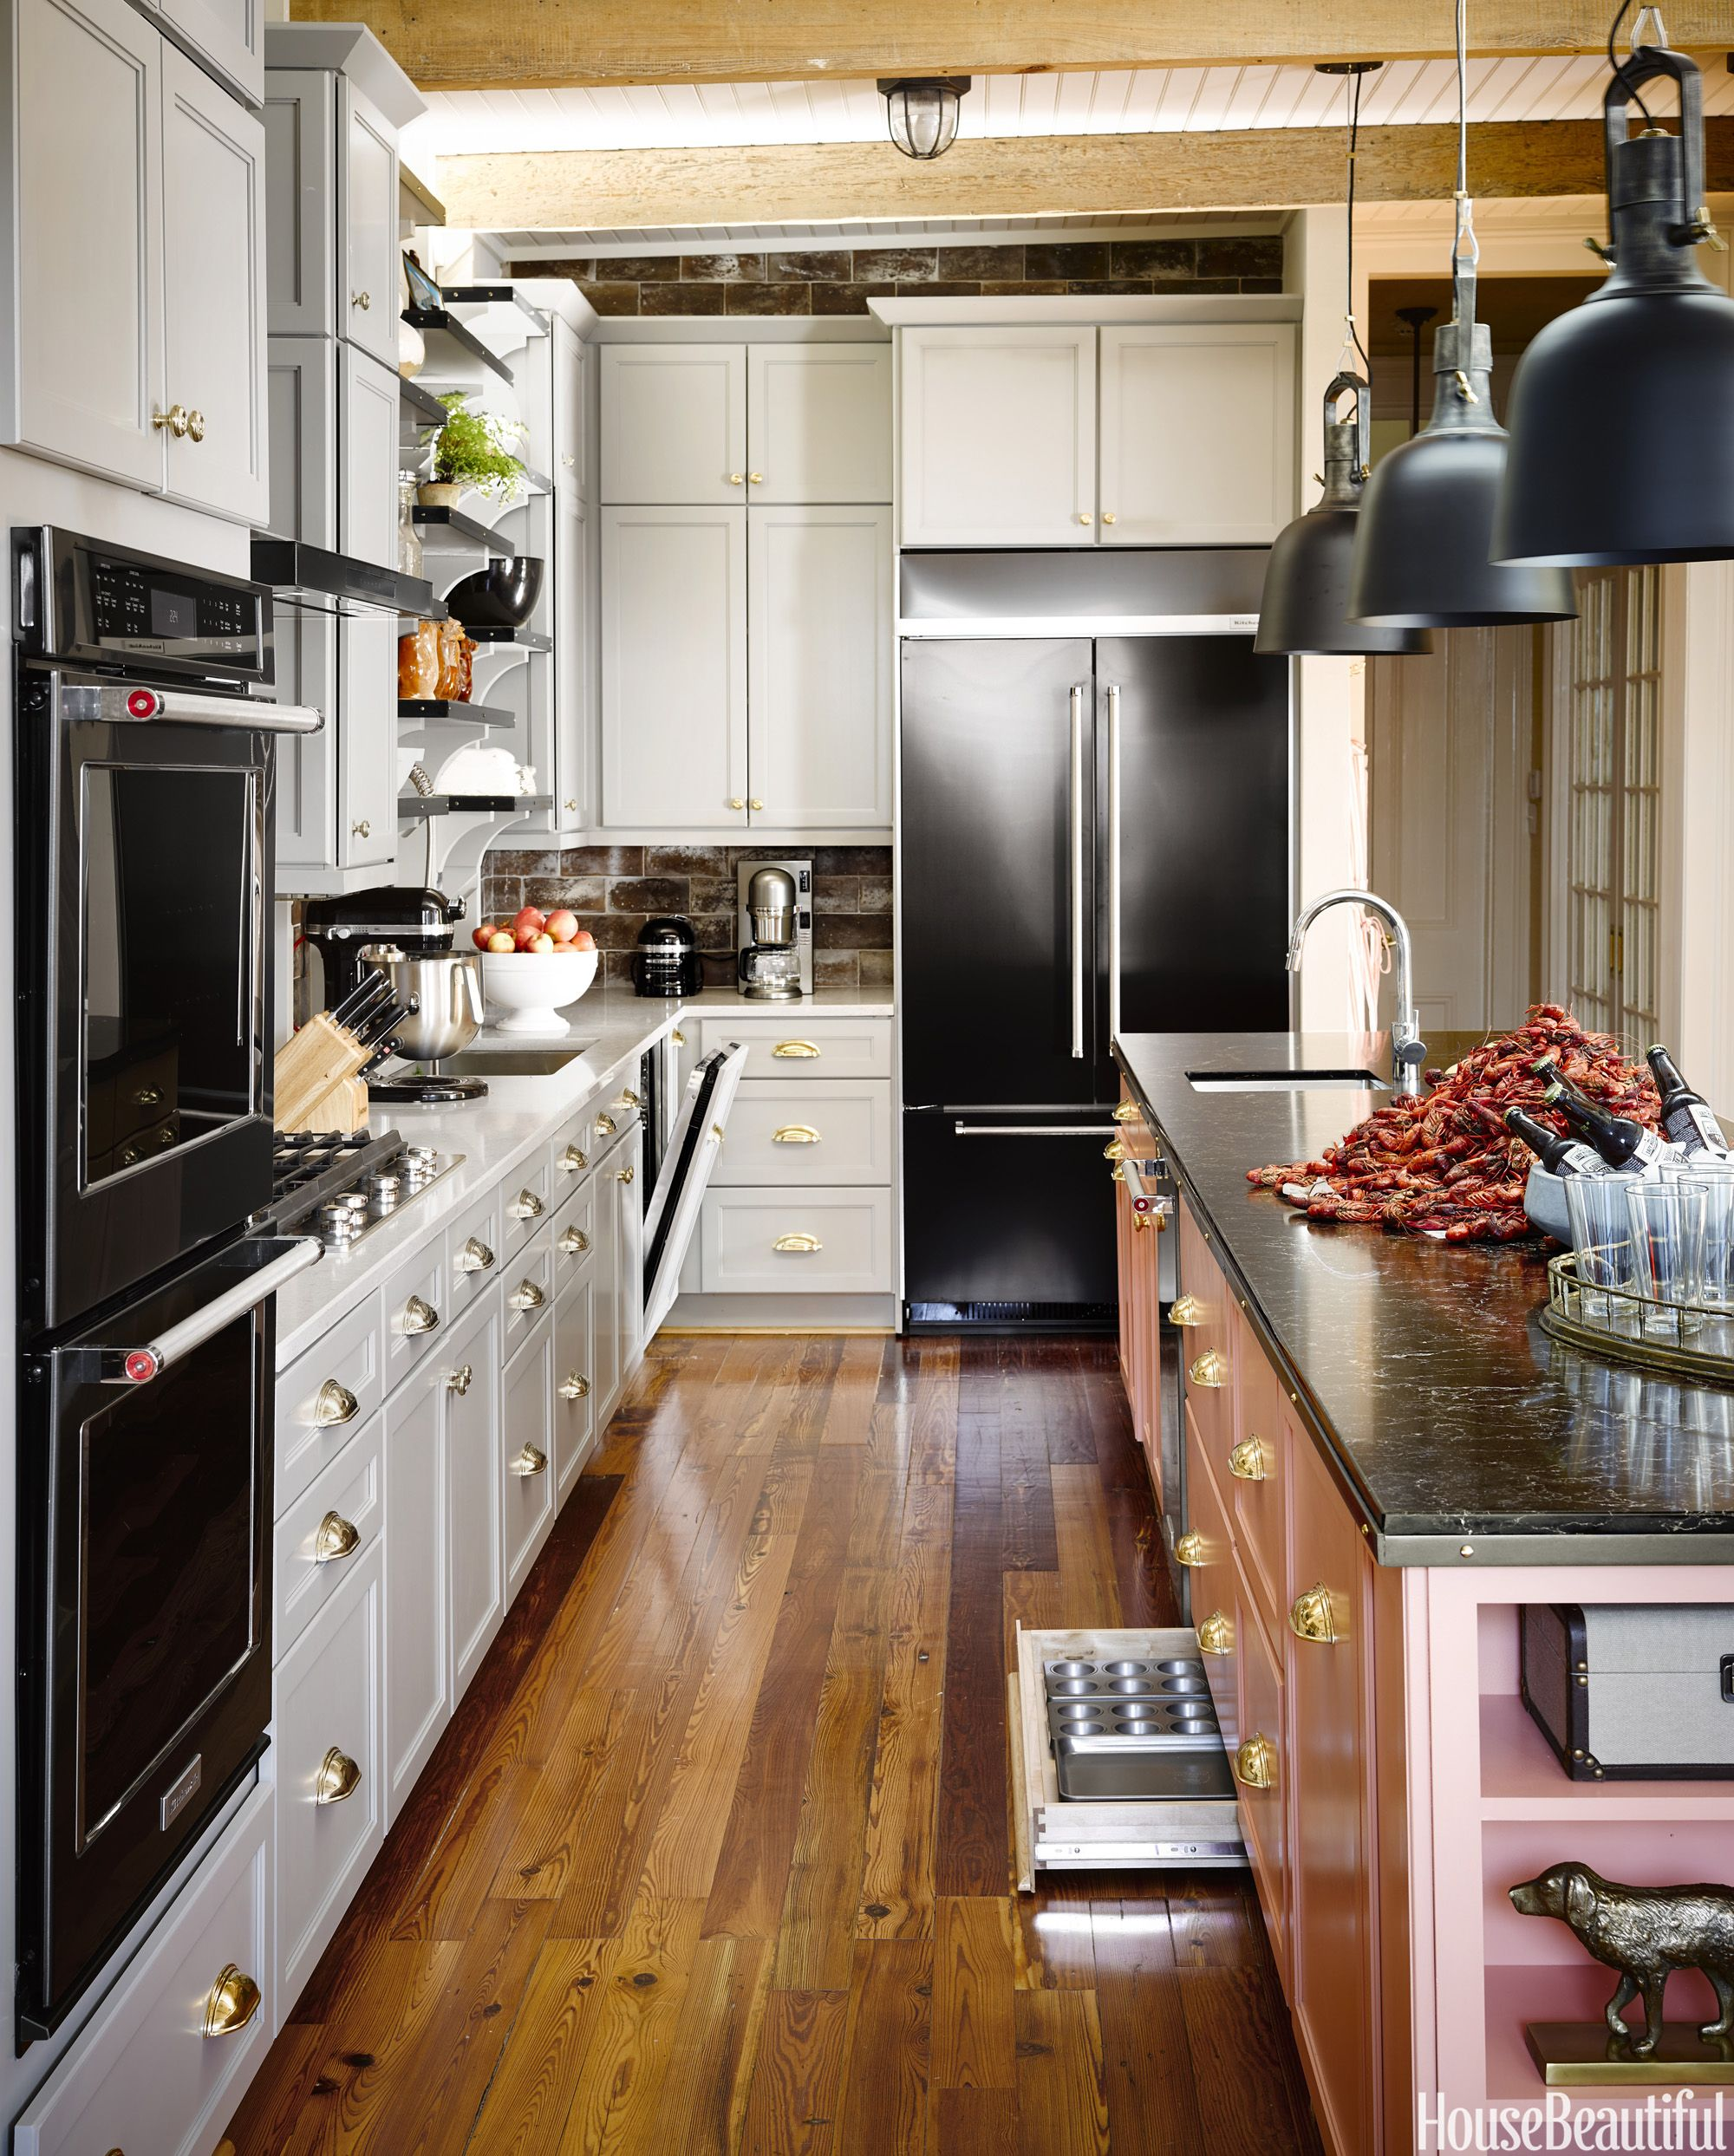 Ken Fulk s House Beautiful Kitchen of the Year 2015